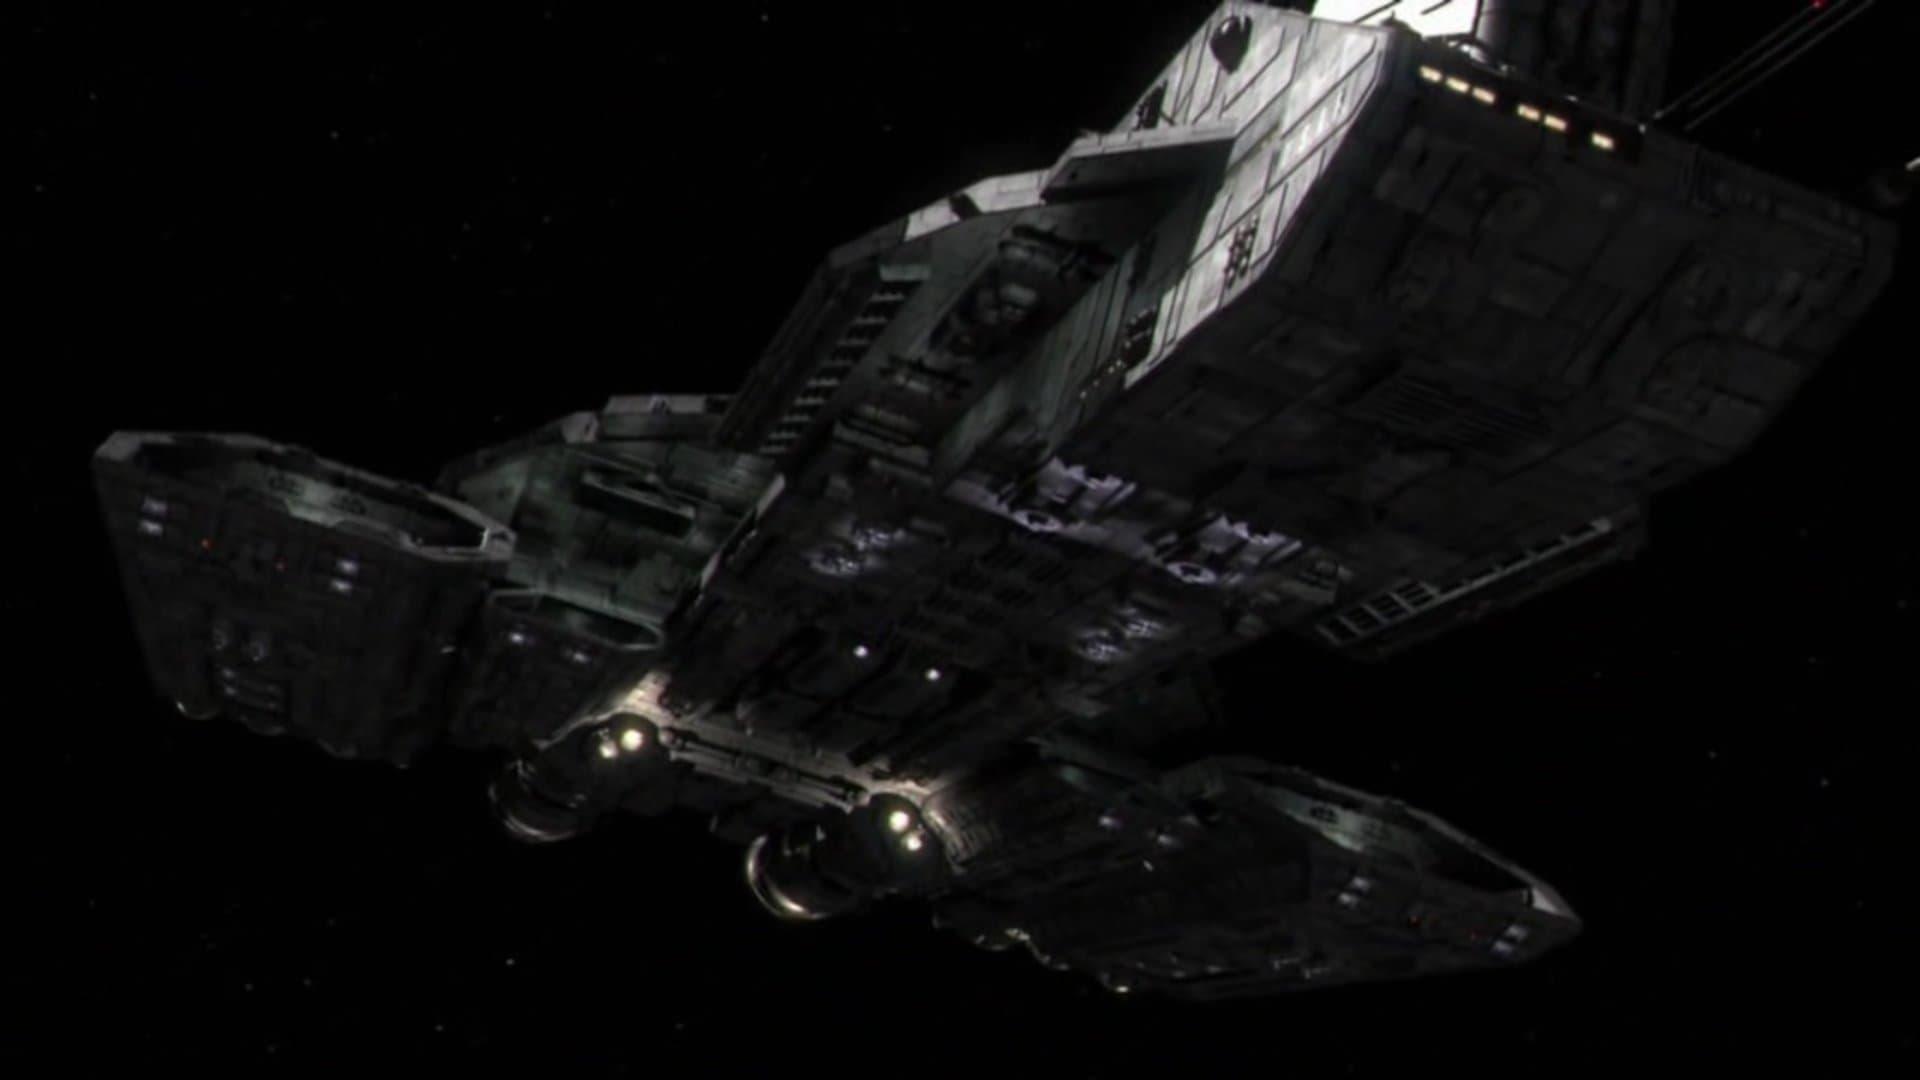 Stargate atlantis 2004 saison 2 pisode 2 filmstreaming - Stargate la porte des etoiles streaming ...